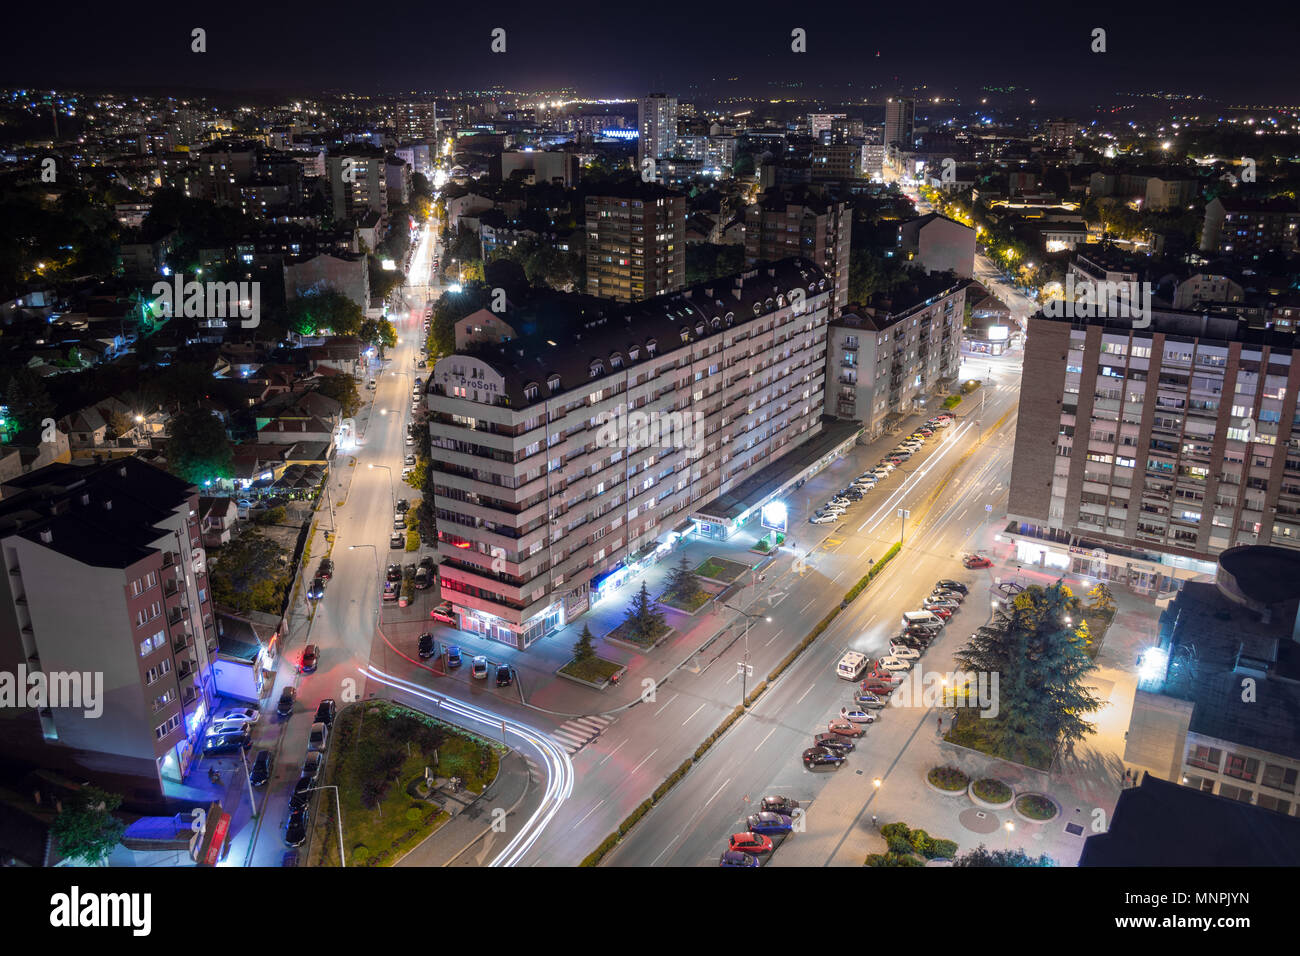 nis-serbia-may-16-2018-nighttime-citysca